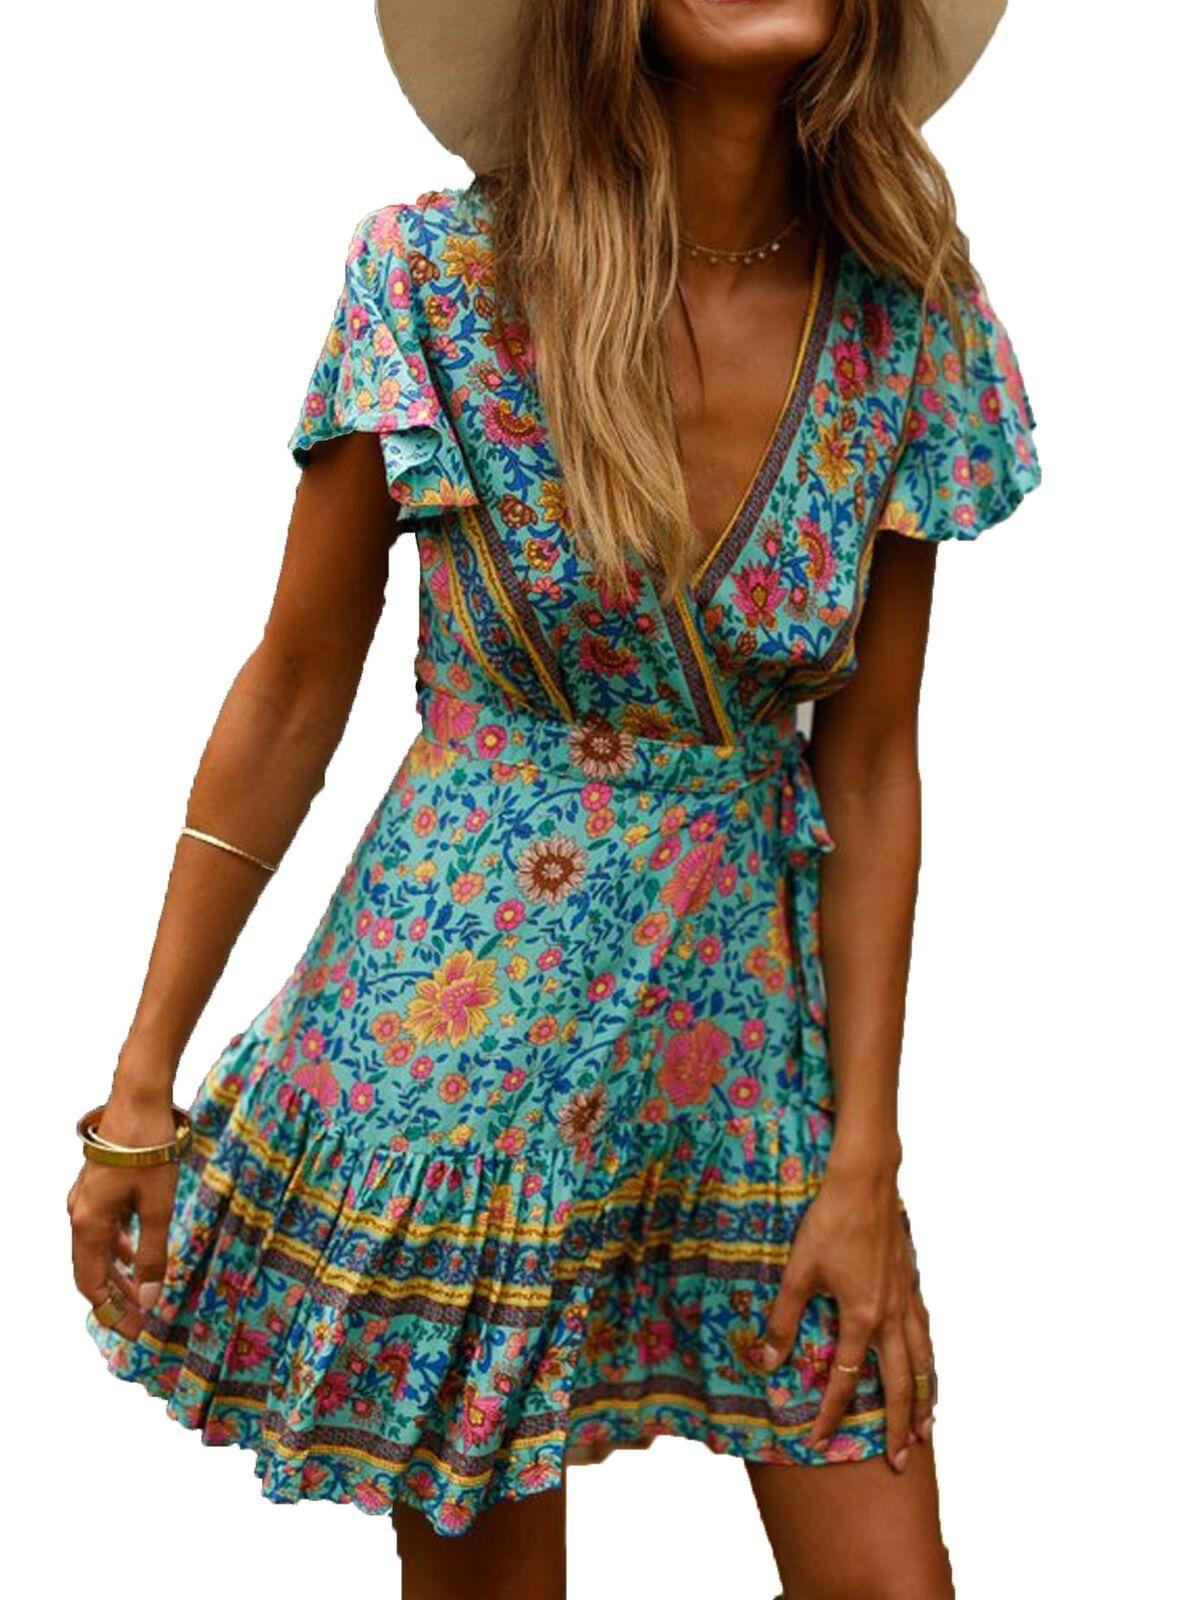 Multitrust Multitrust Women Short Sleeve Wrap Boho Floral Mini Dress Ladies Summer Sundress Walmart Com In 2021 Boho Dress Winter Short Sleeve Mini Dress Ruffle Dress [ 1600 x 1200 Pixel ]